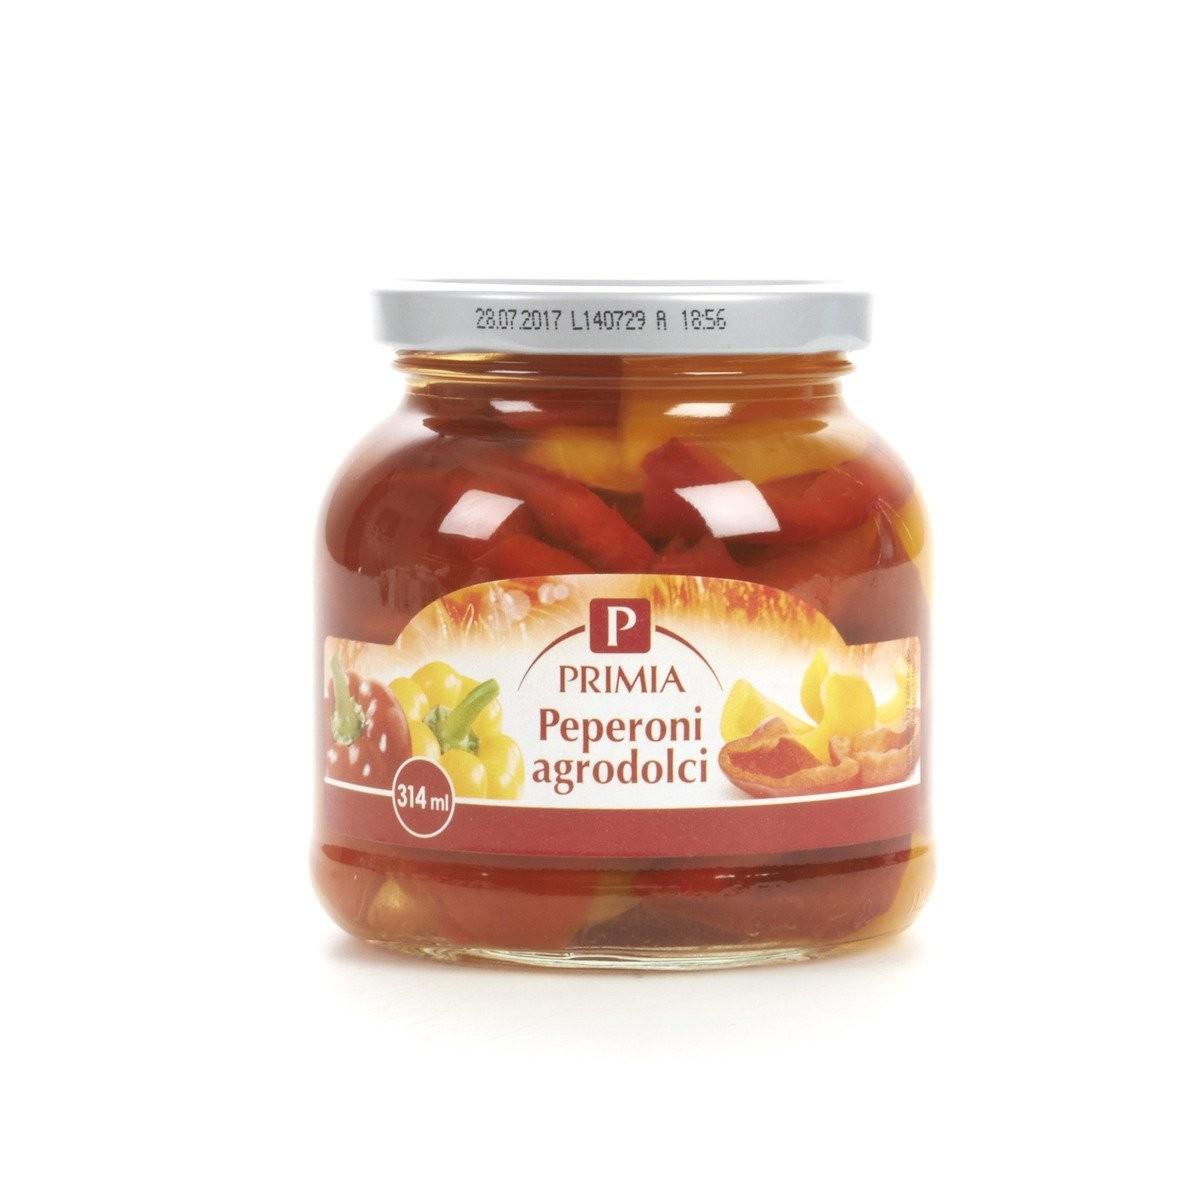 Primia Peperoni agrodolci